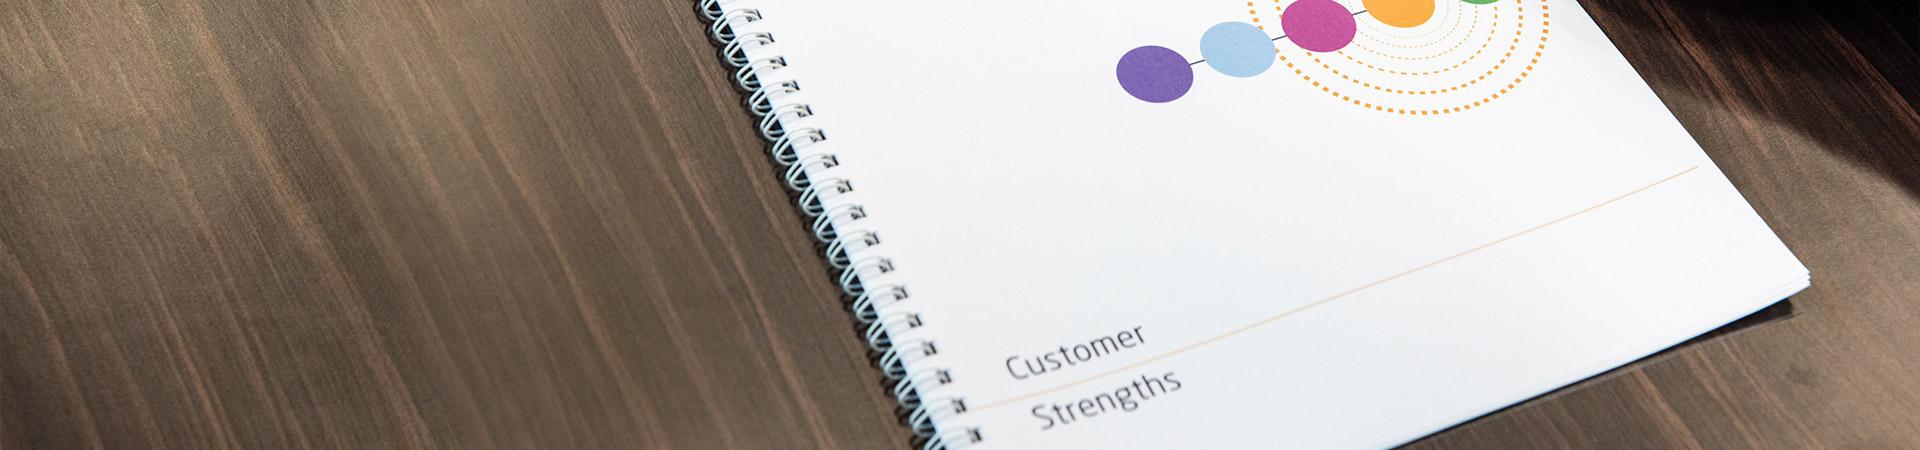 Customer strengths questionnaire psychometric test